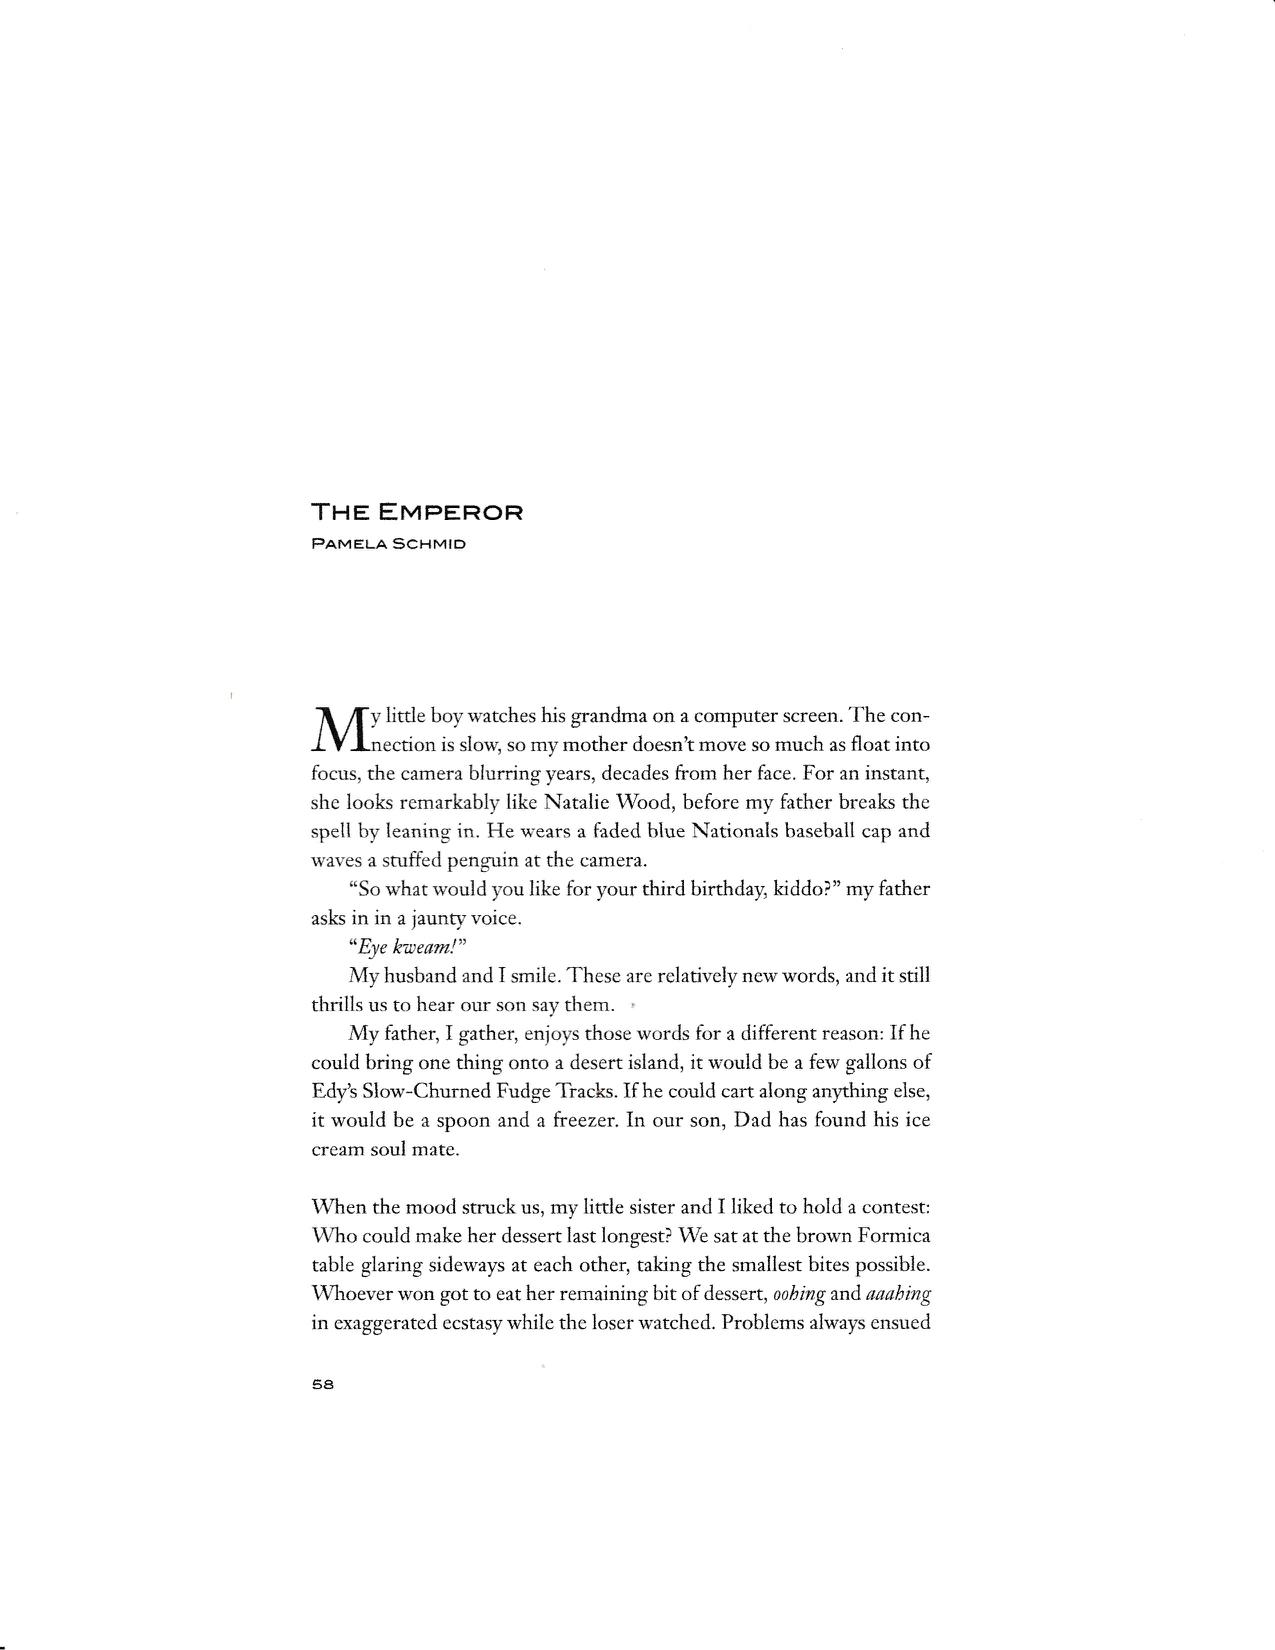 Tahoma_Literary_Review_The_Emperor 02.jpg